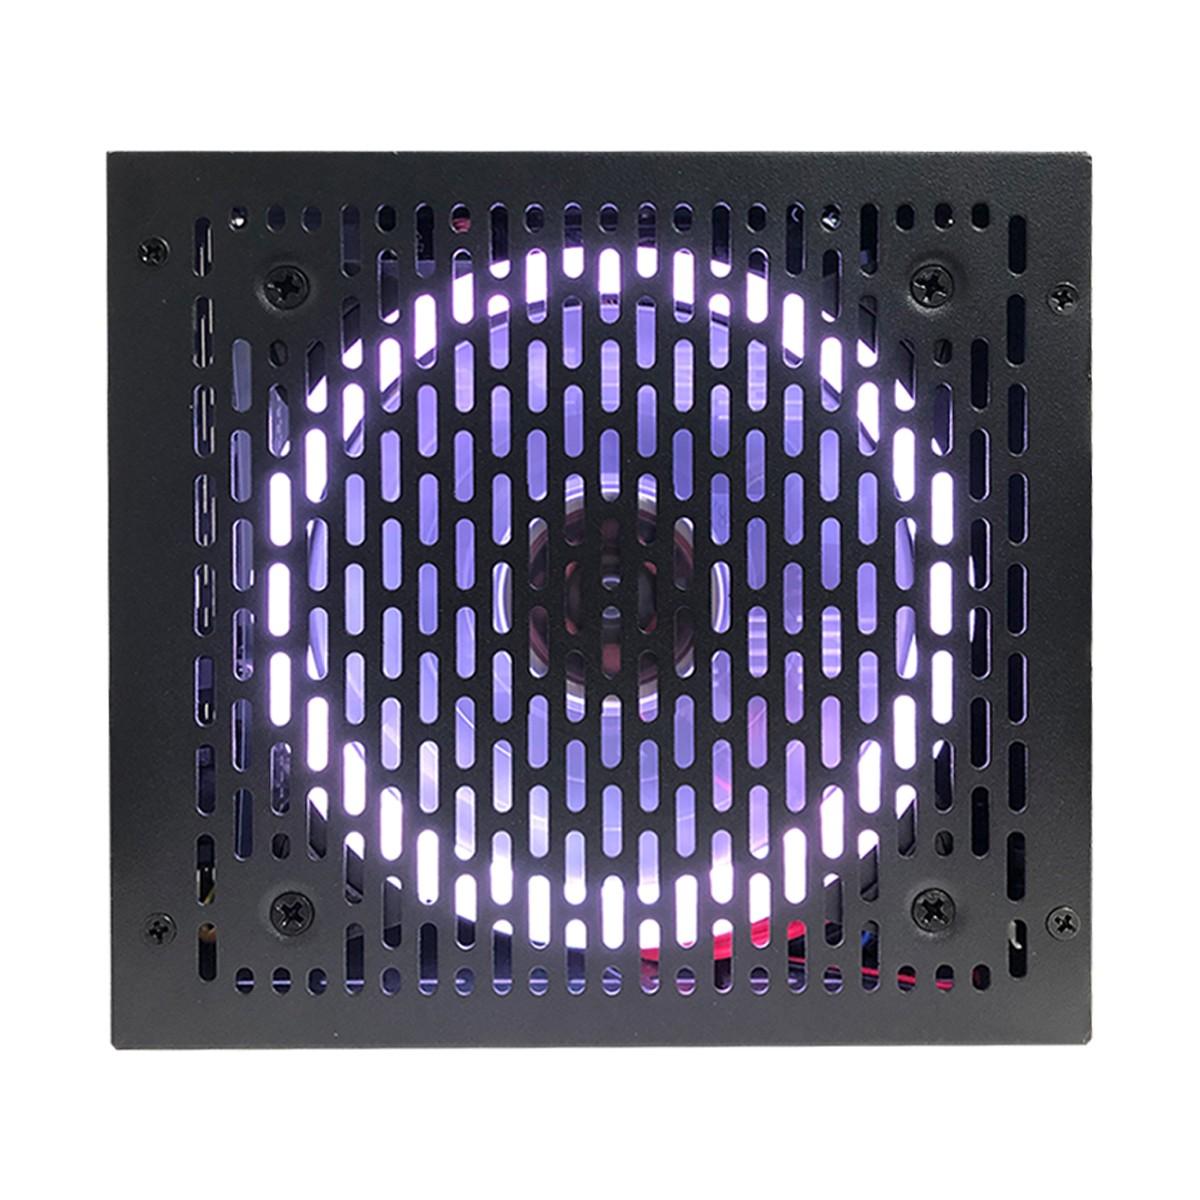 Fonte Gamer ATX BRX Rainbow 500W Real, 80 Plus Bronze, Cooler120mm RGB, Bivolt Automático